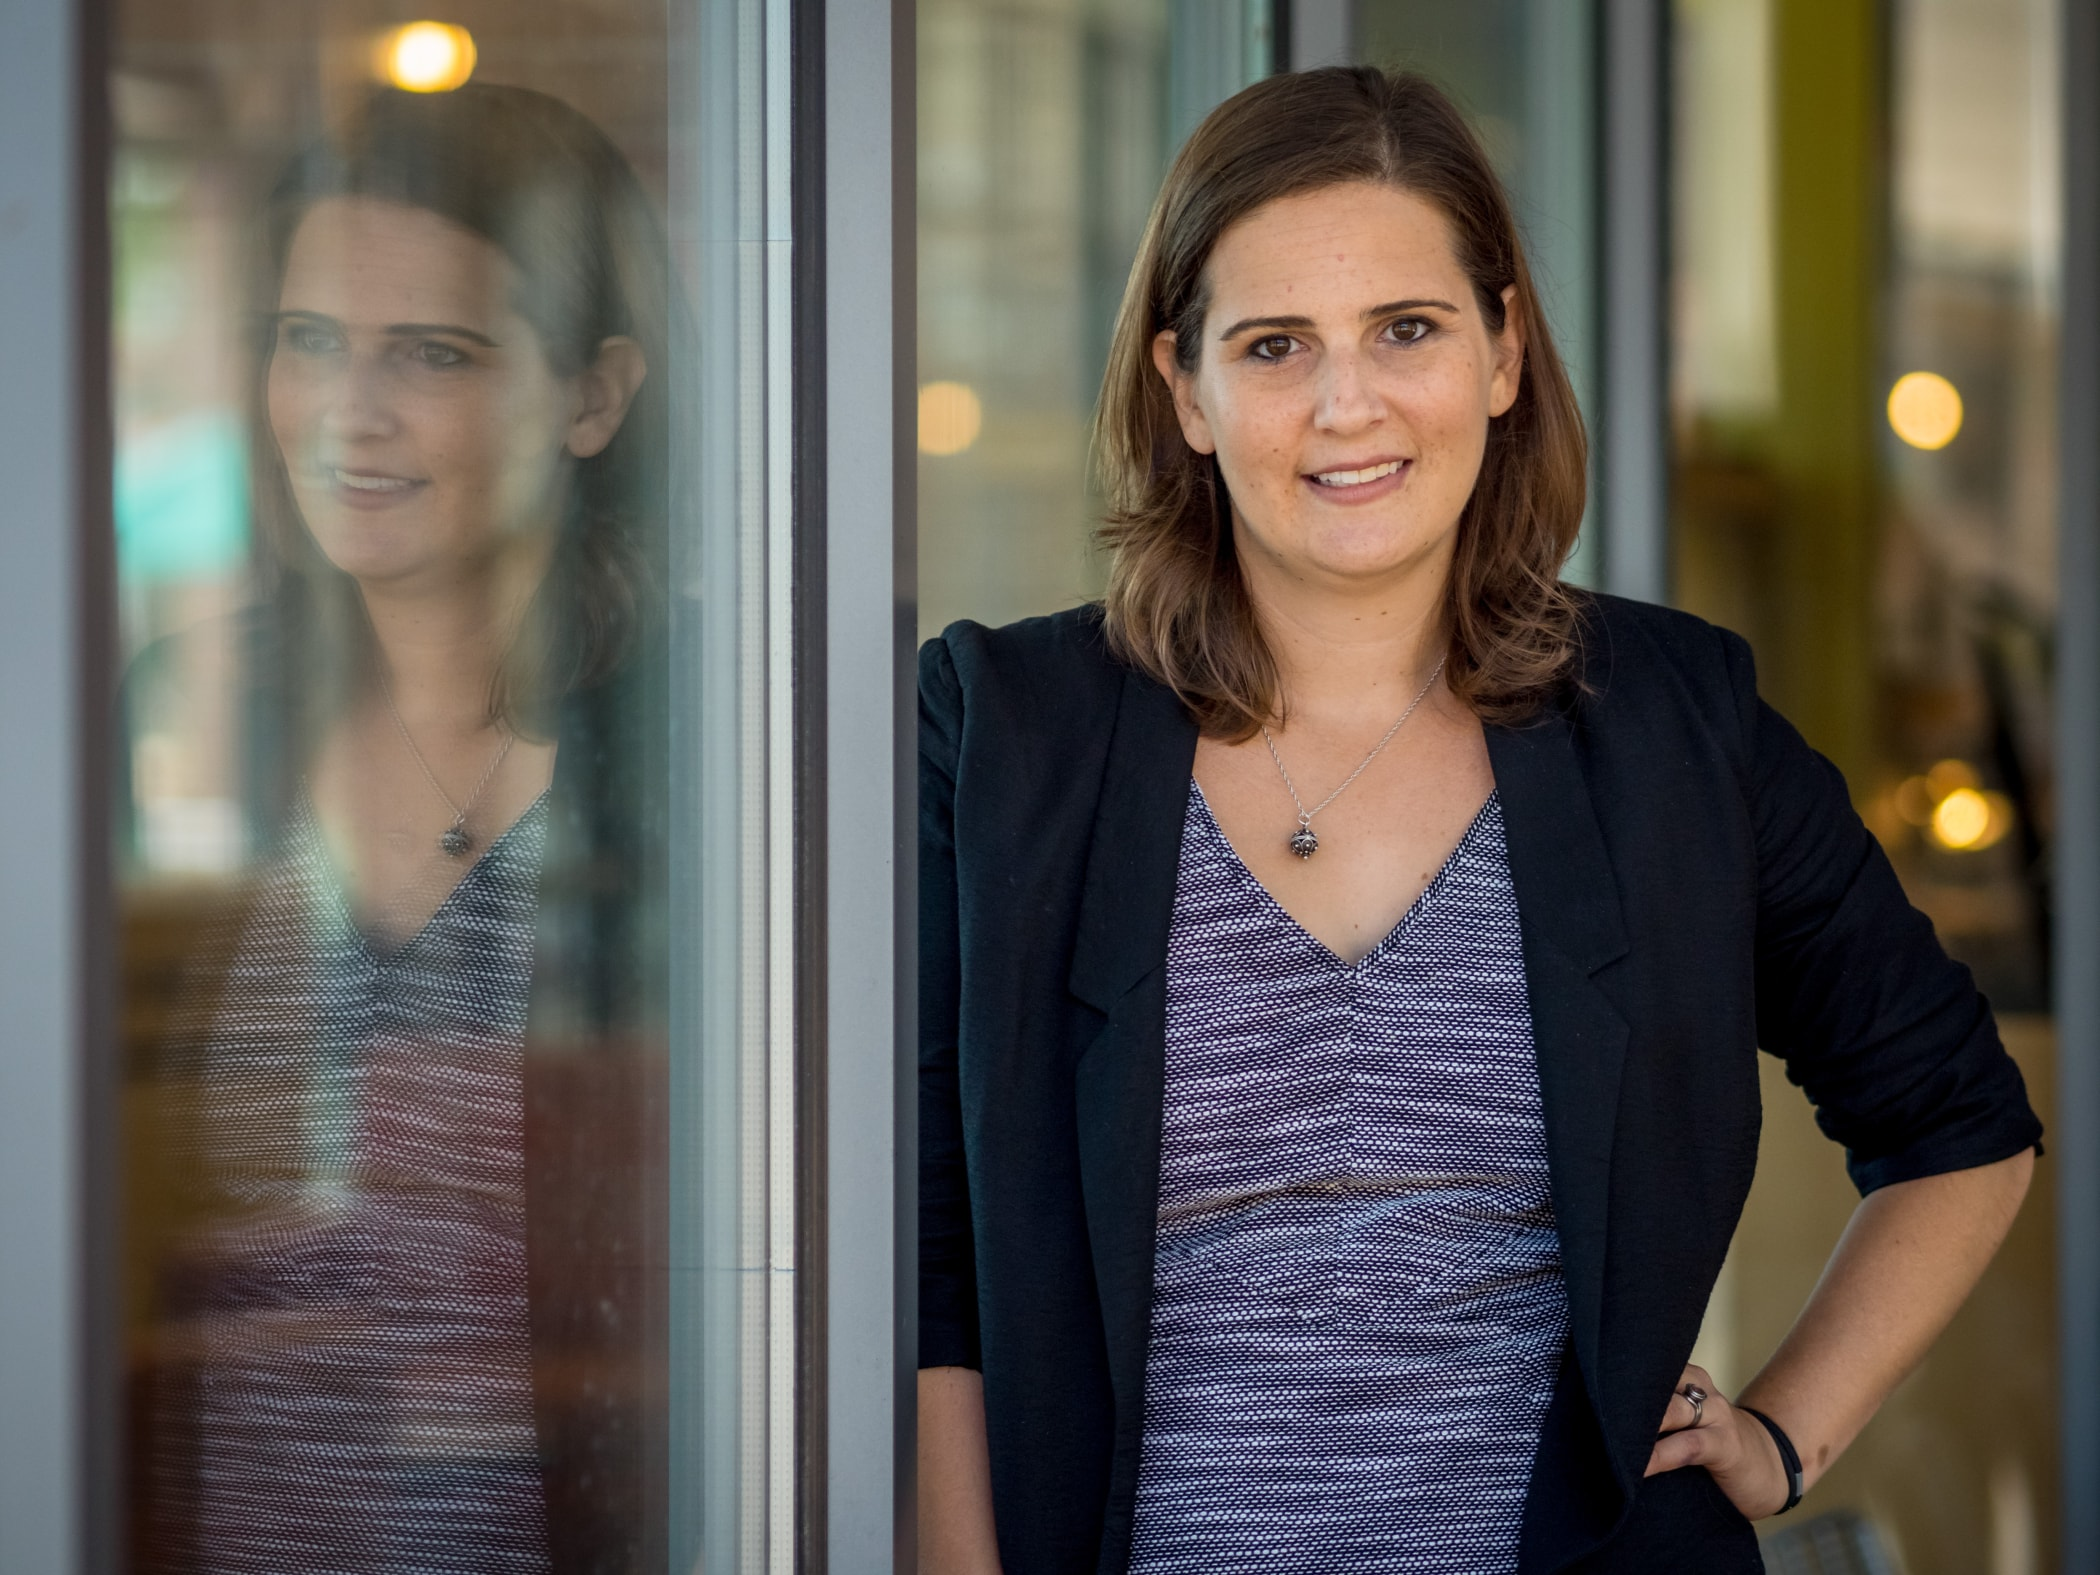 Assistant Professor Sarah Lowe